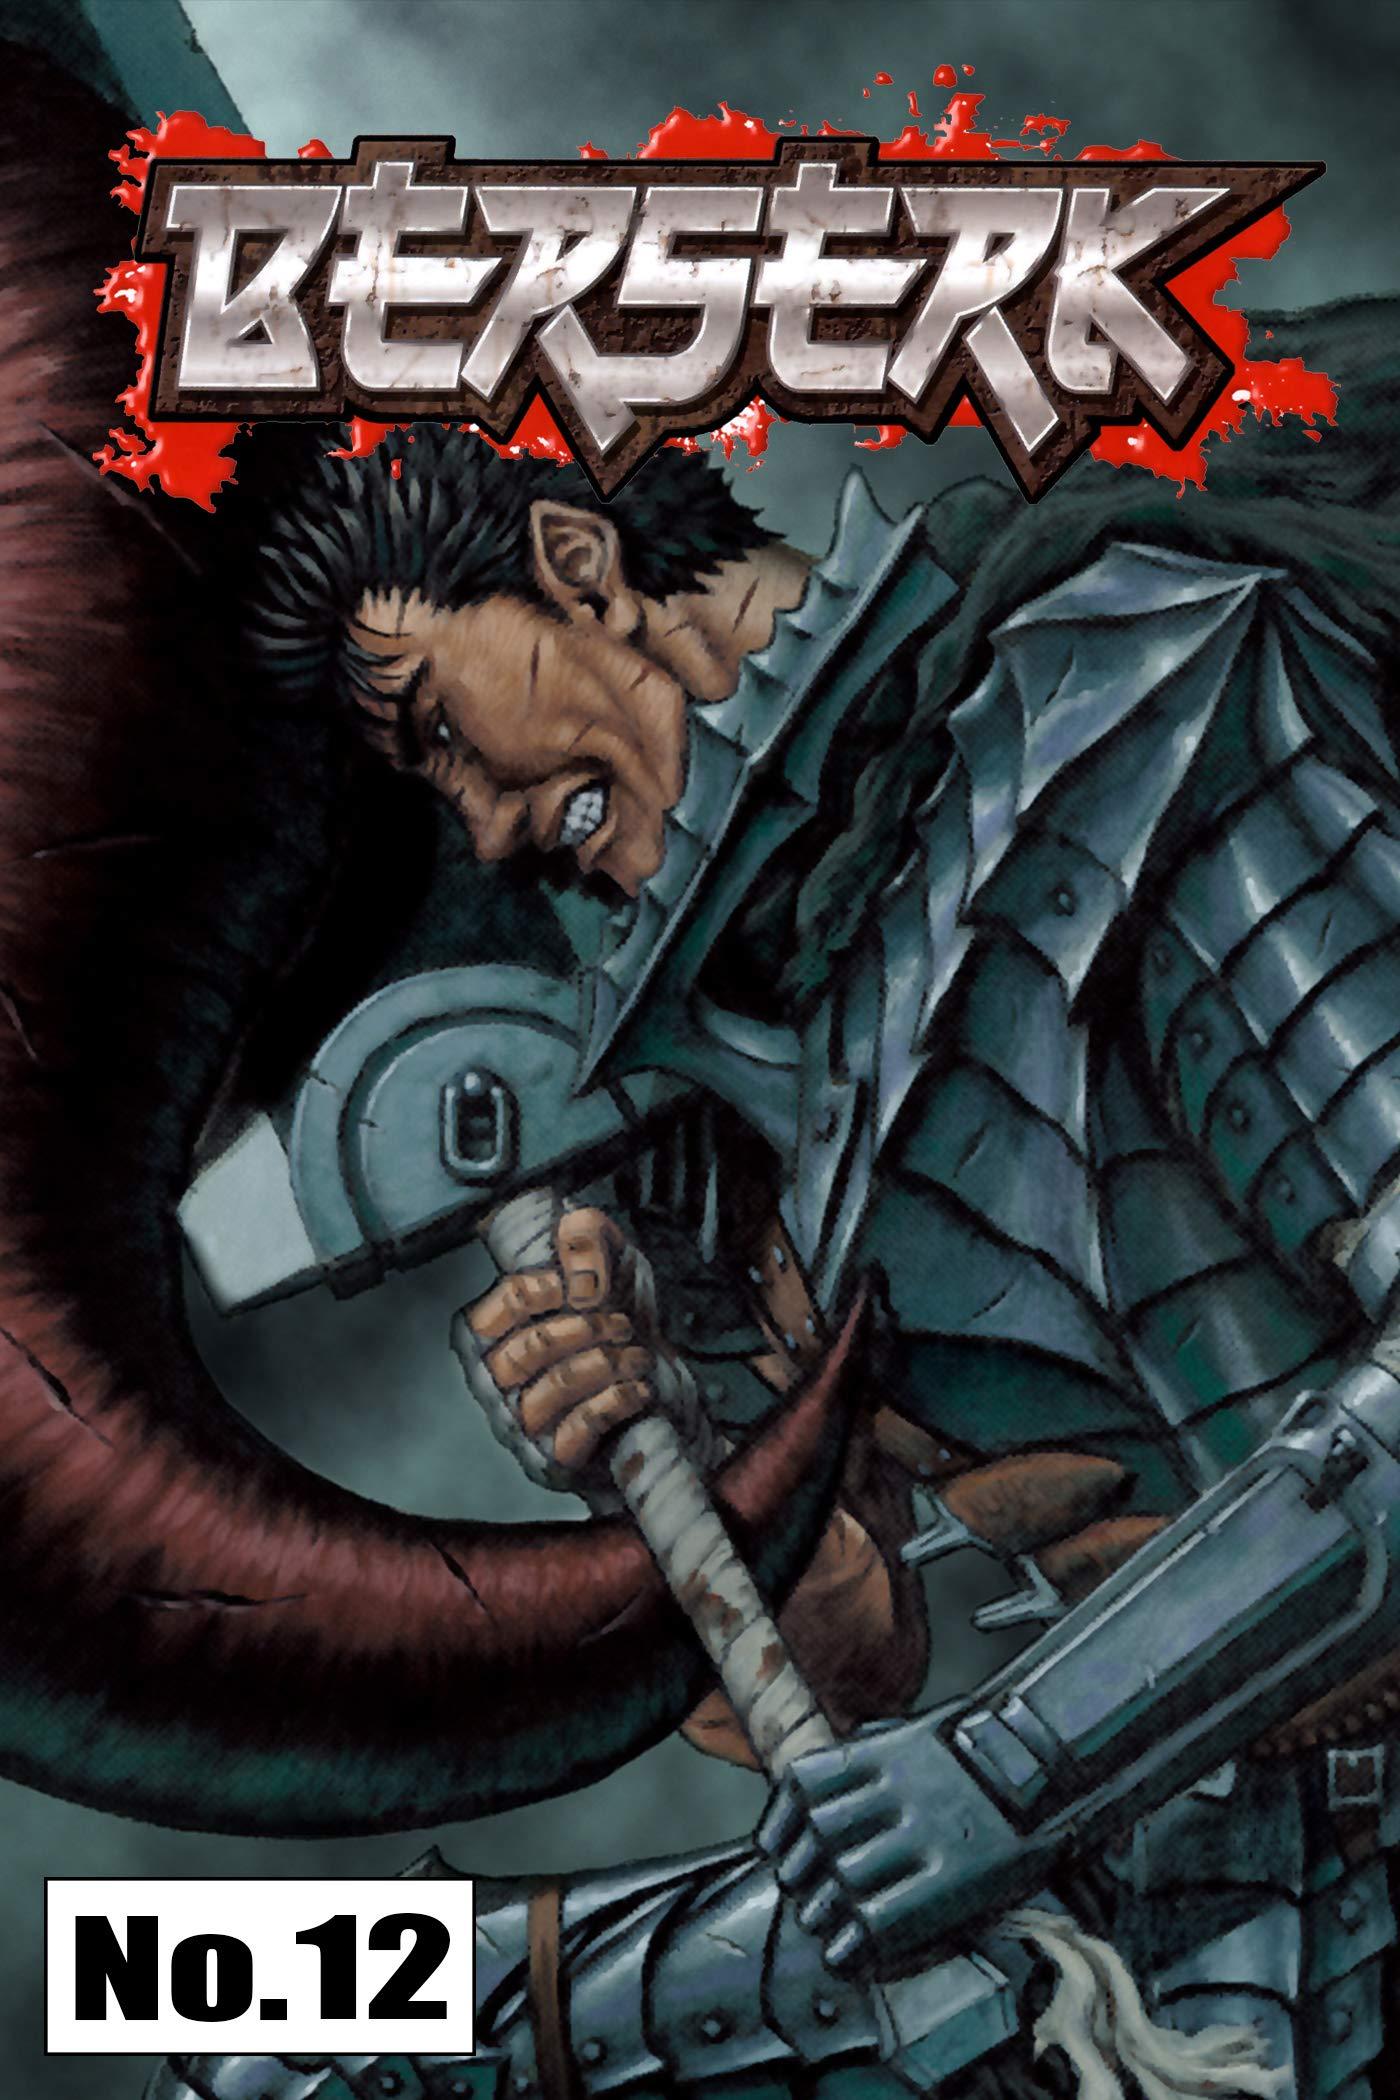 Best Fantasy Collection Manga: Berserk No 12